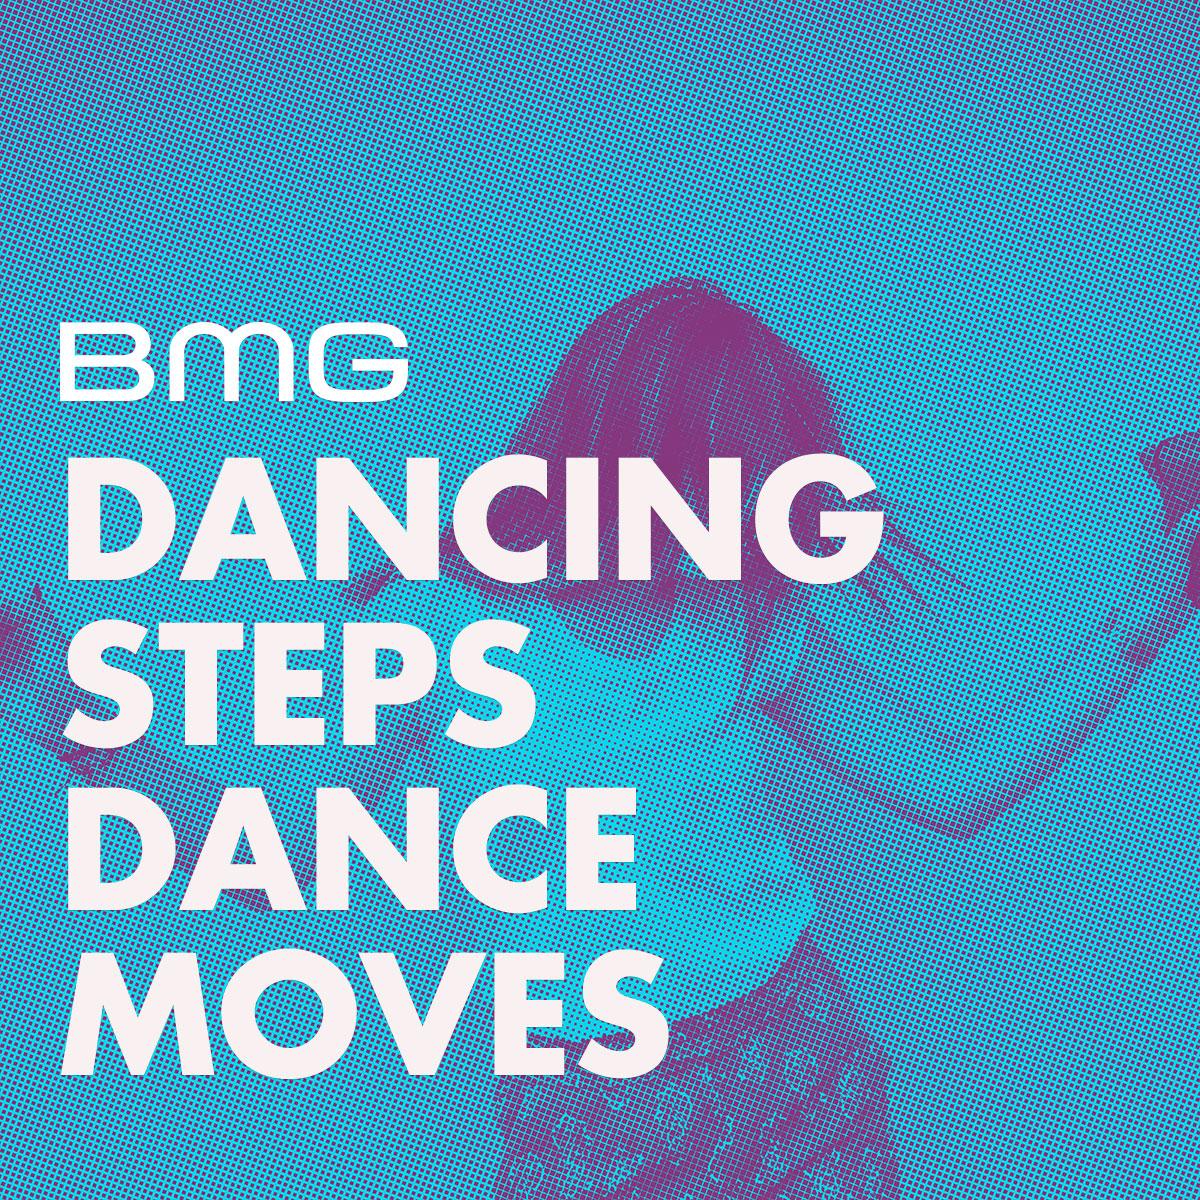 1200-x-1200-Dancing-Steps-Moves.jpg